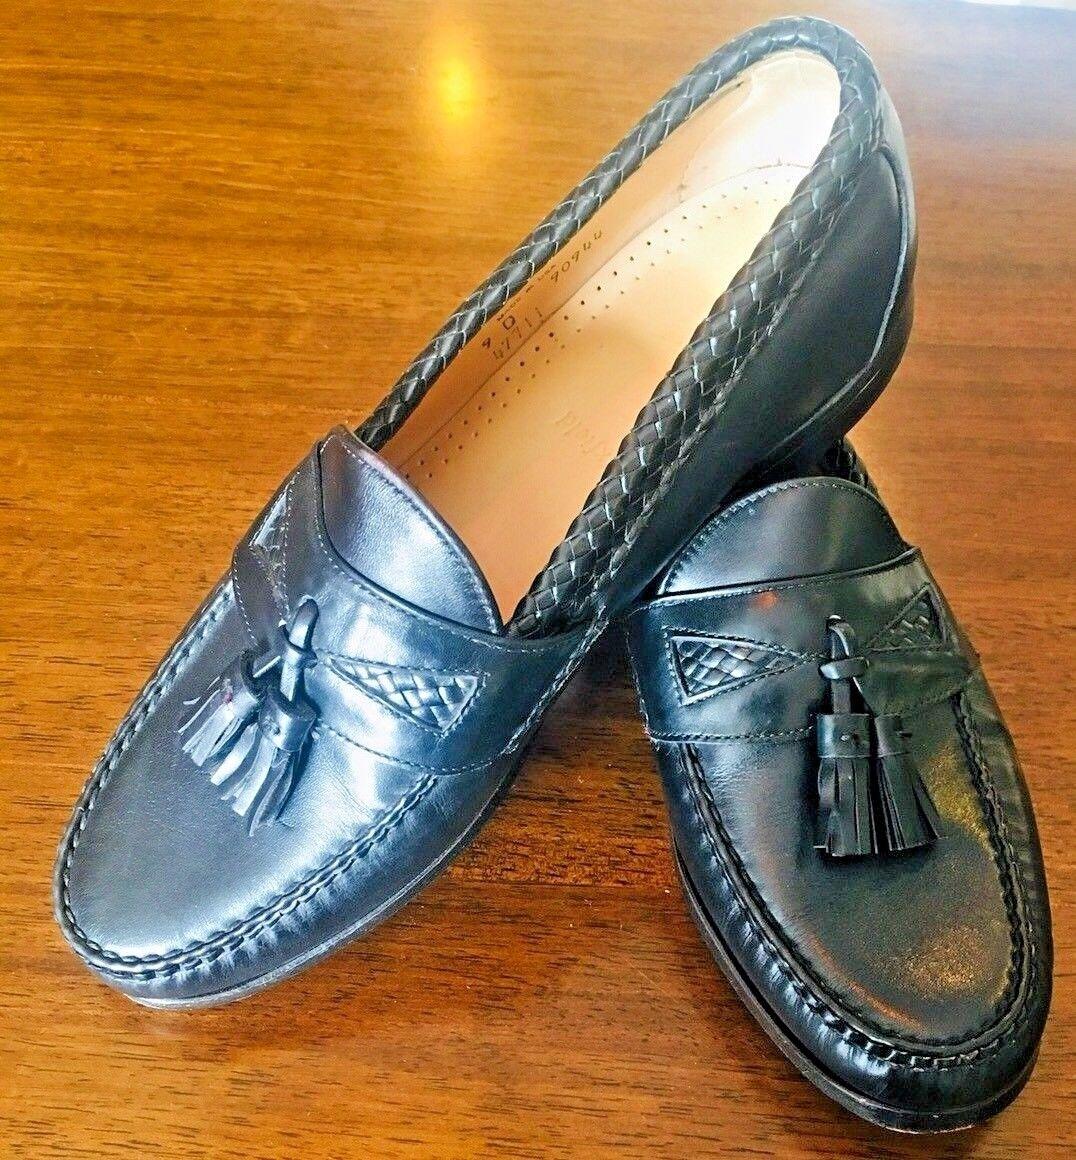 ALLEN EDMONDS MAXFIELD BLACK Leder Leder BLACK Slip On Tassels Weave DRESS Loafers 9D #189 e1909a